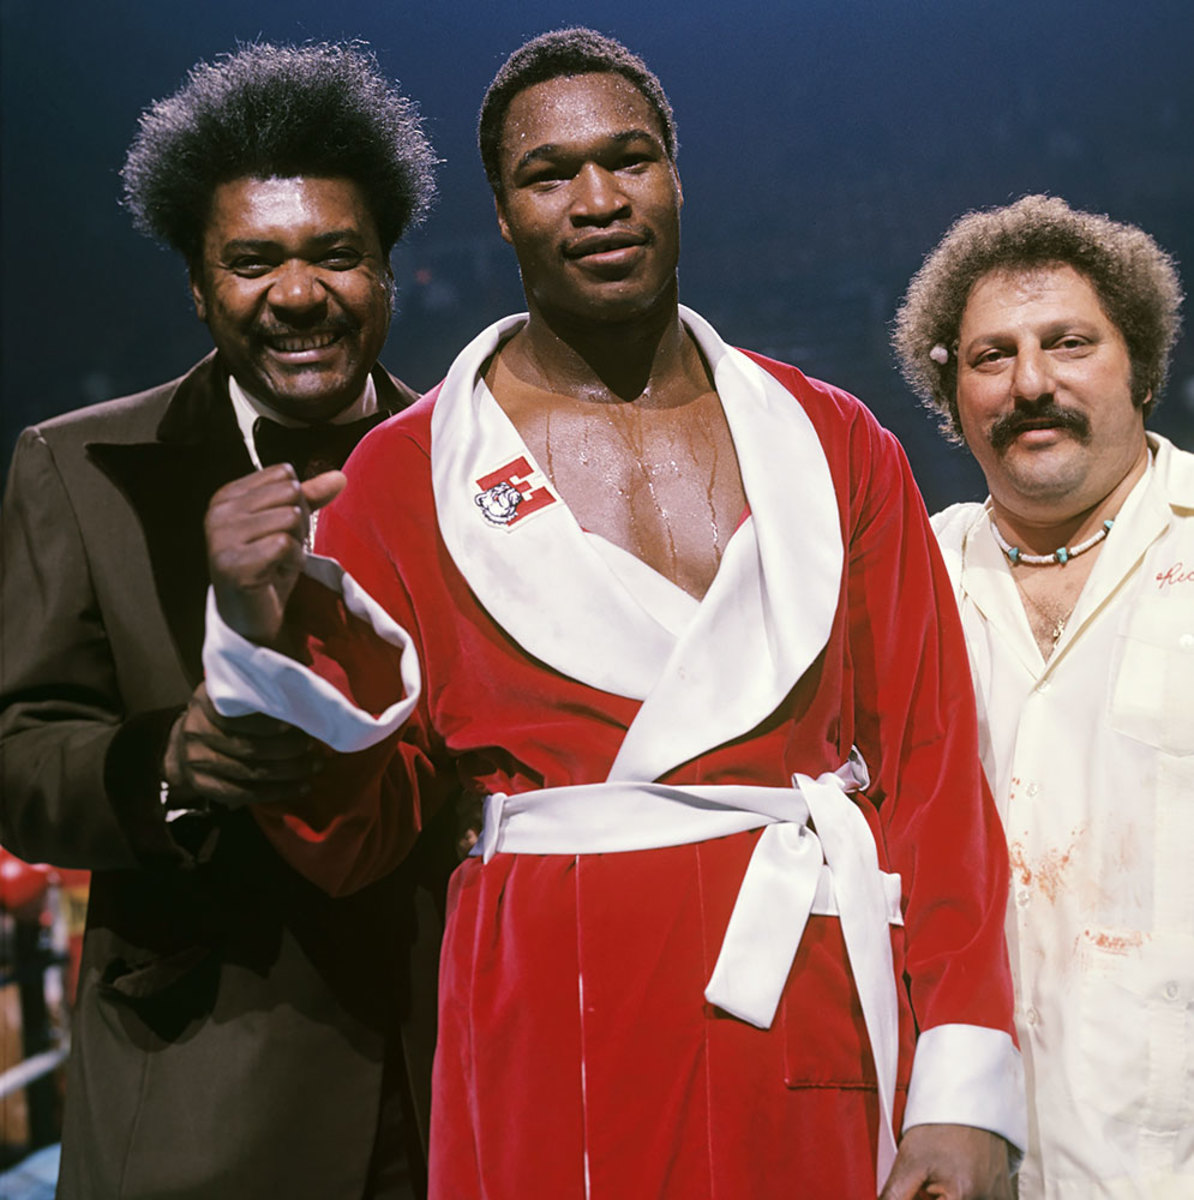 1976-0405-Don-King-Larry-Holmes-Richie-Giachetti-NLC_00716.jpg